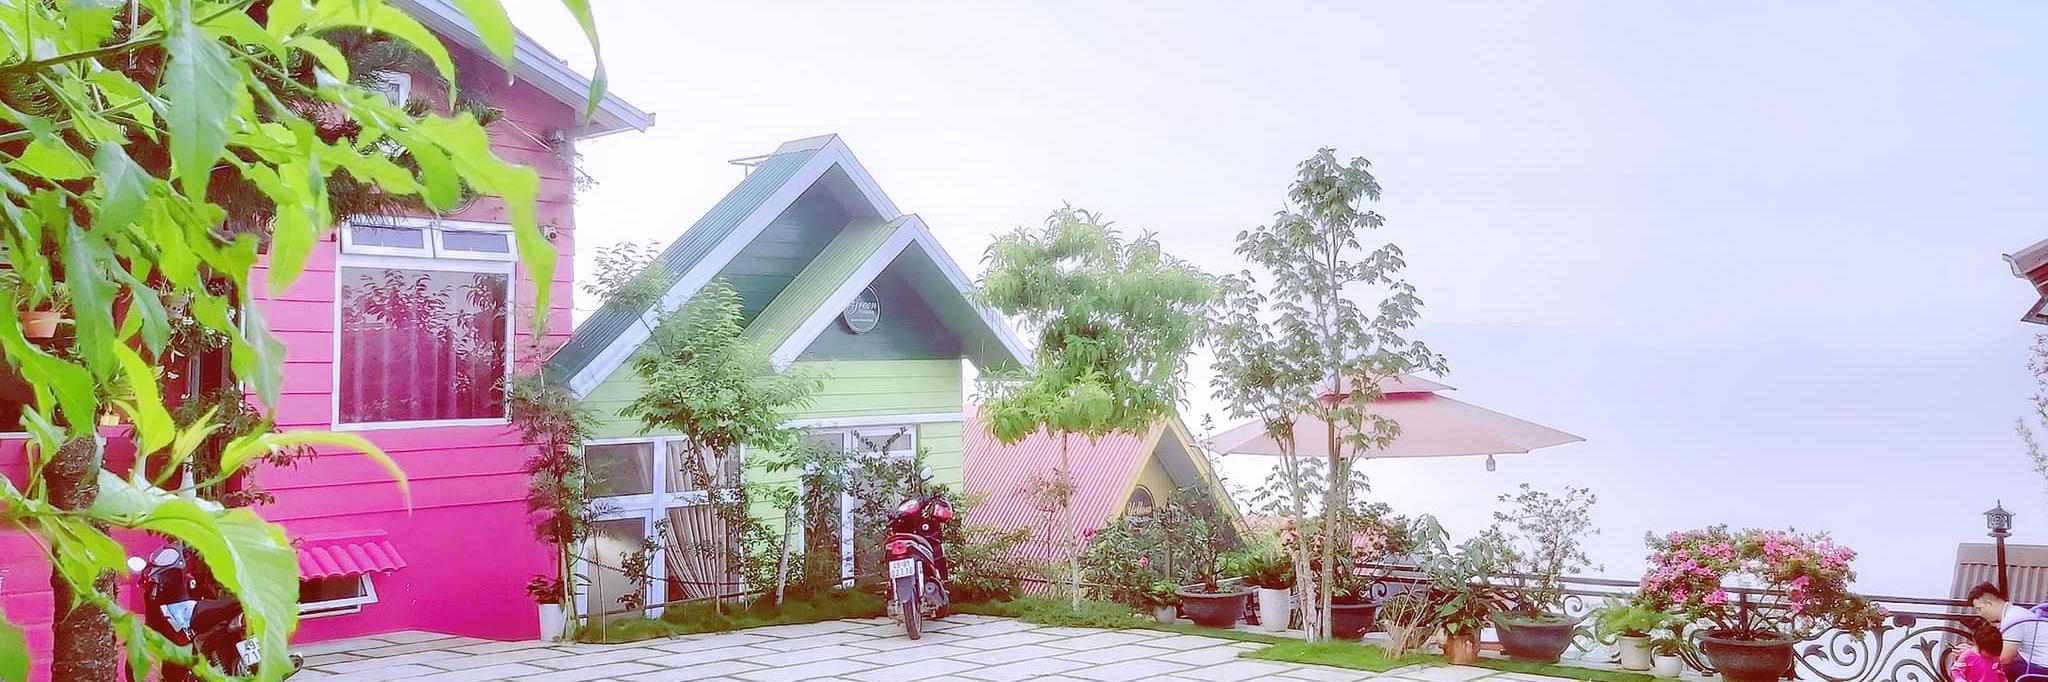 https://gody.vn/blog/hanguyen23413/post/homestay-da-lat-70-homestay-dep-o-da-lat-gia-500k-view-bao-dep-7316